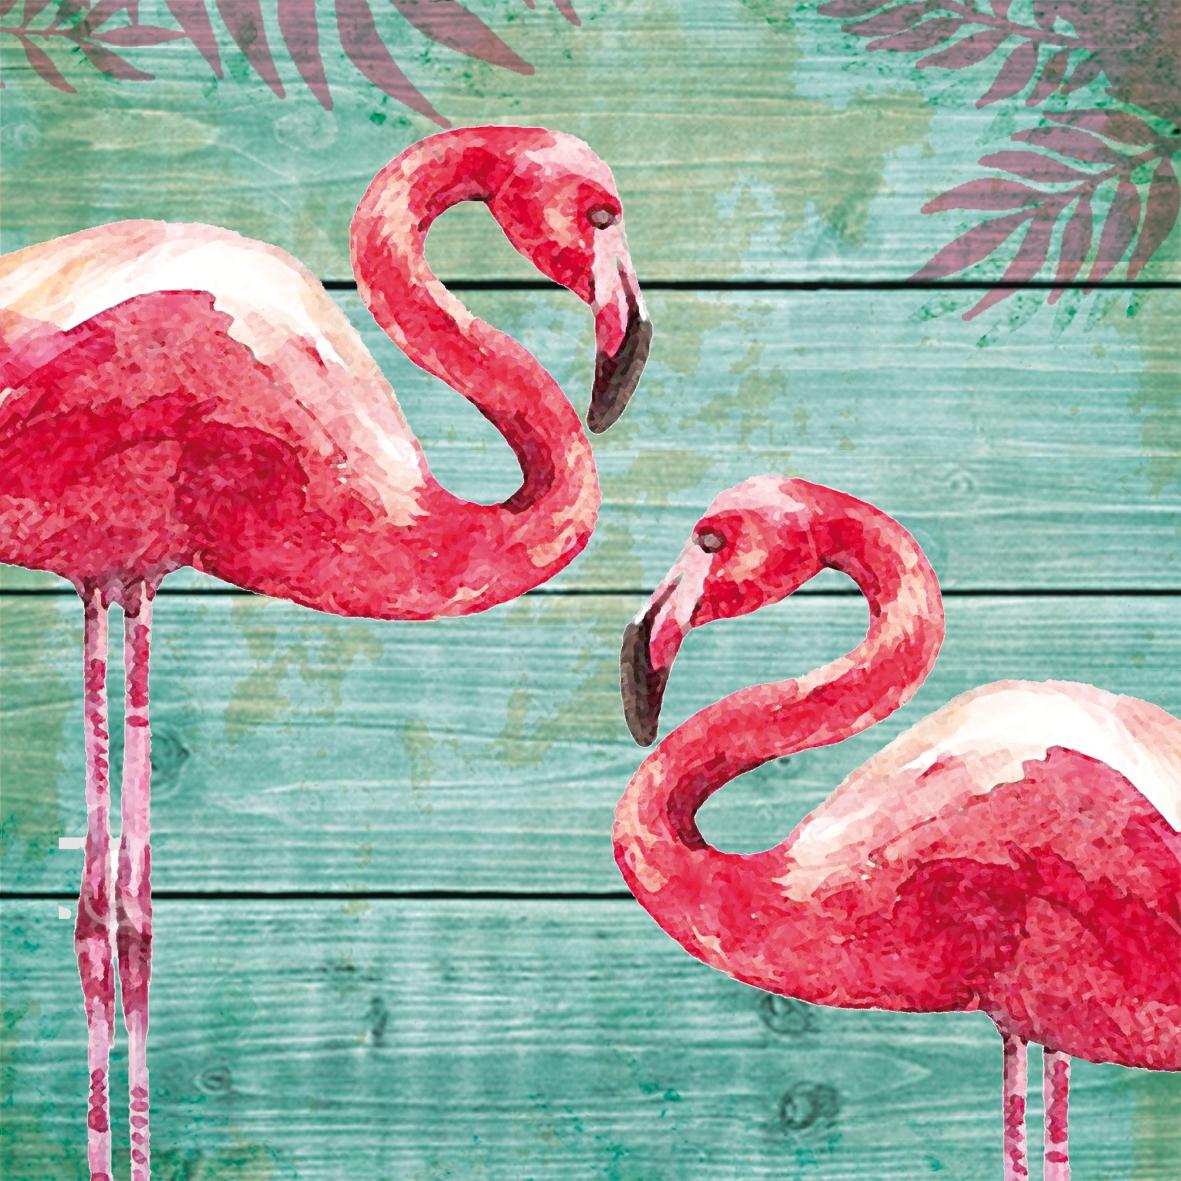 Lunch Servietten Summer Flamingos,  Tiere - Vögel,  Everyday,  lunchservietten,  Flamingo